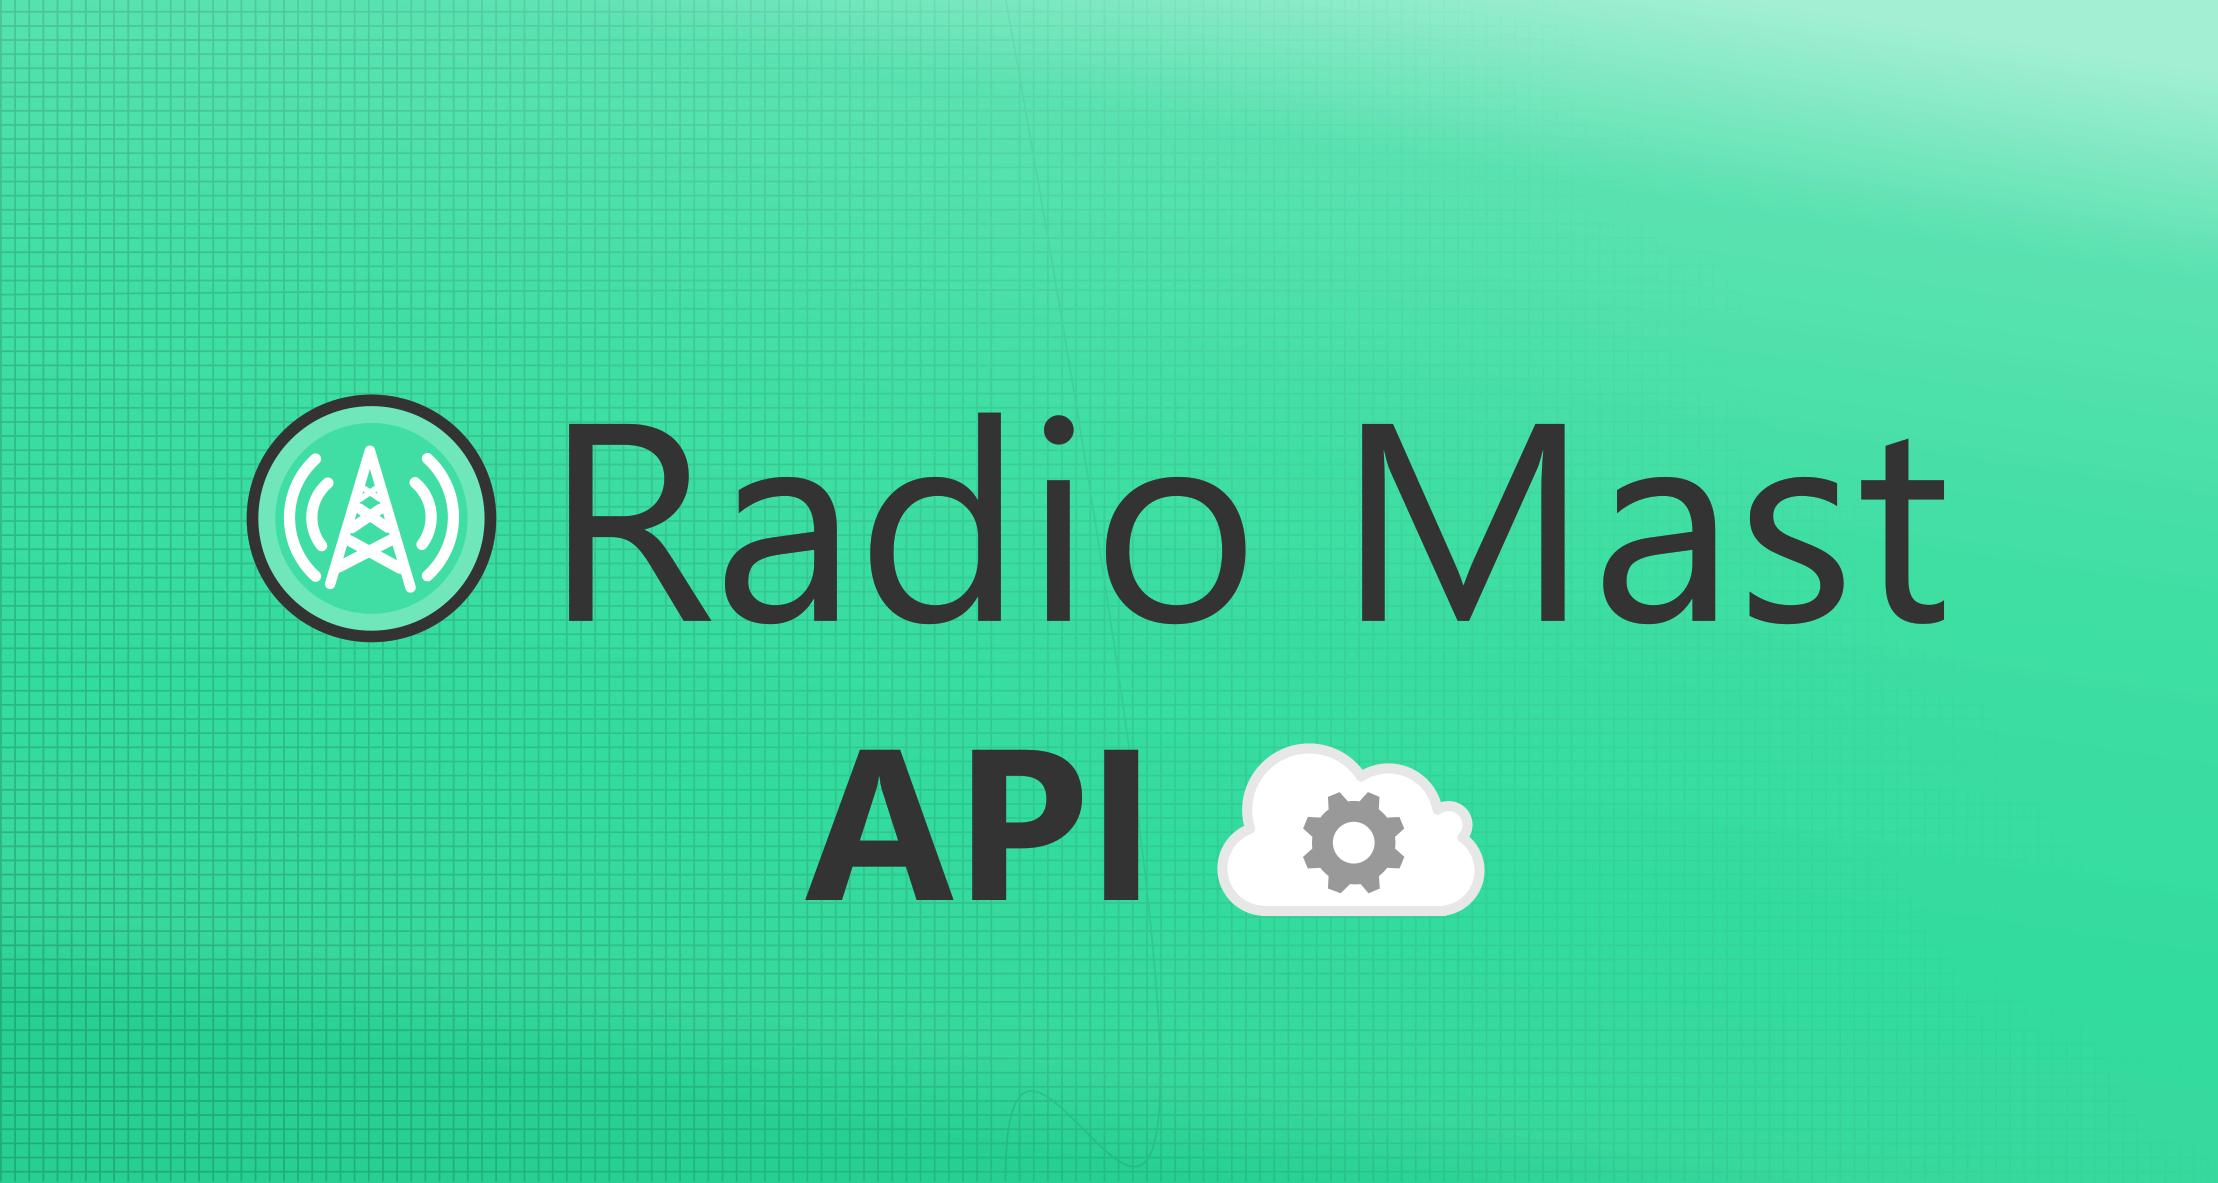 Introducing the Radio Mast API